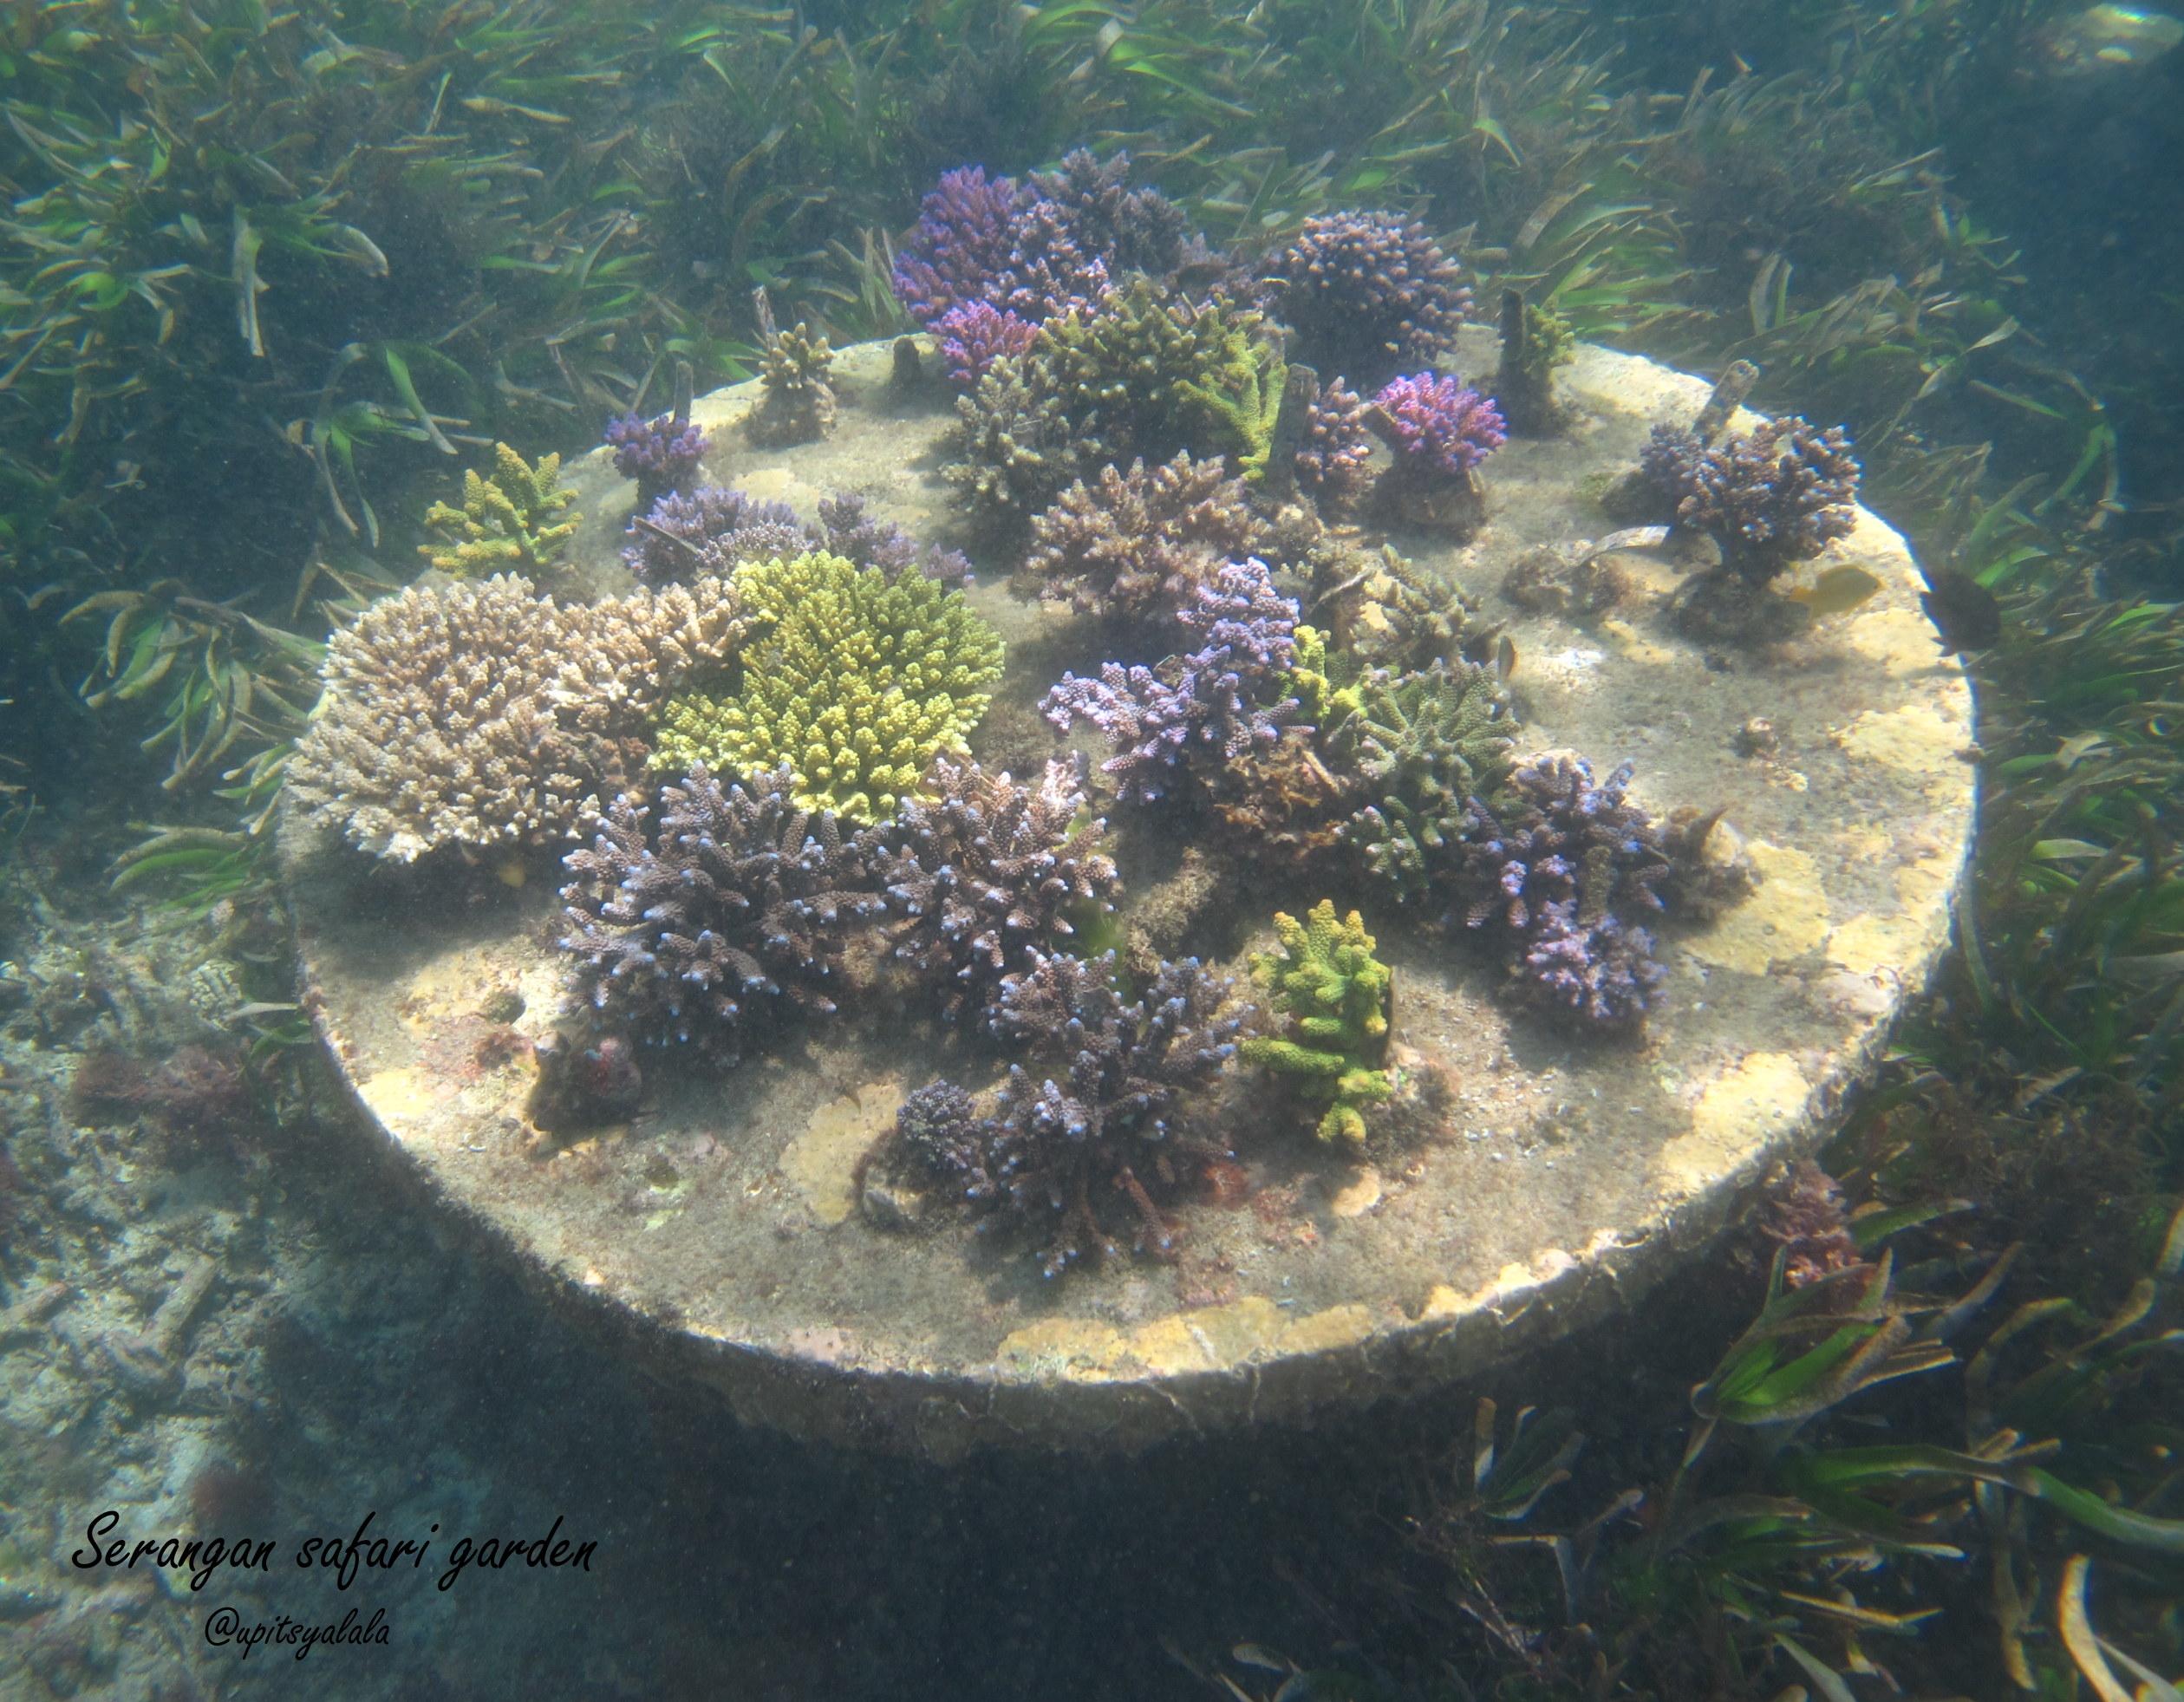 Liburanhijau Petualangan Ekowisata Bahari Pulau Serangan Hasil Transplantasi Karang Zona